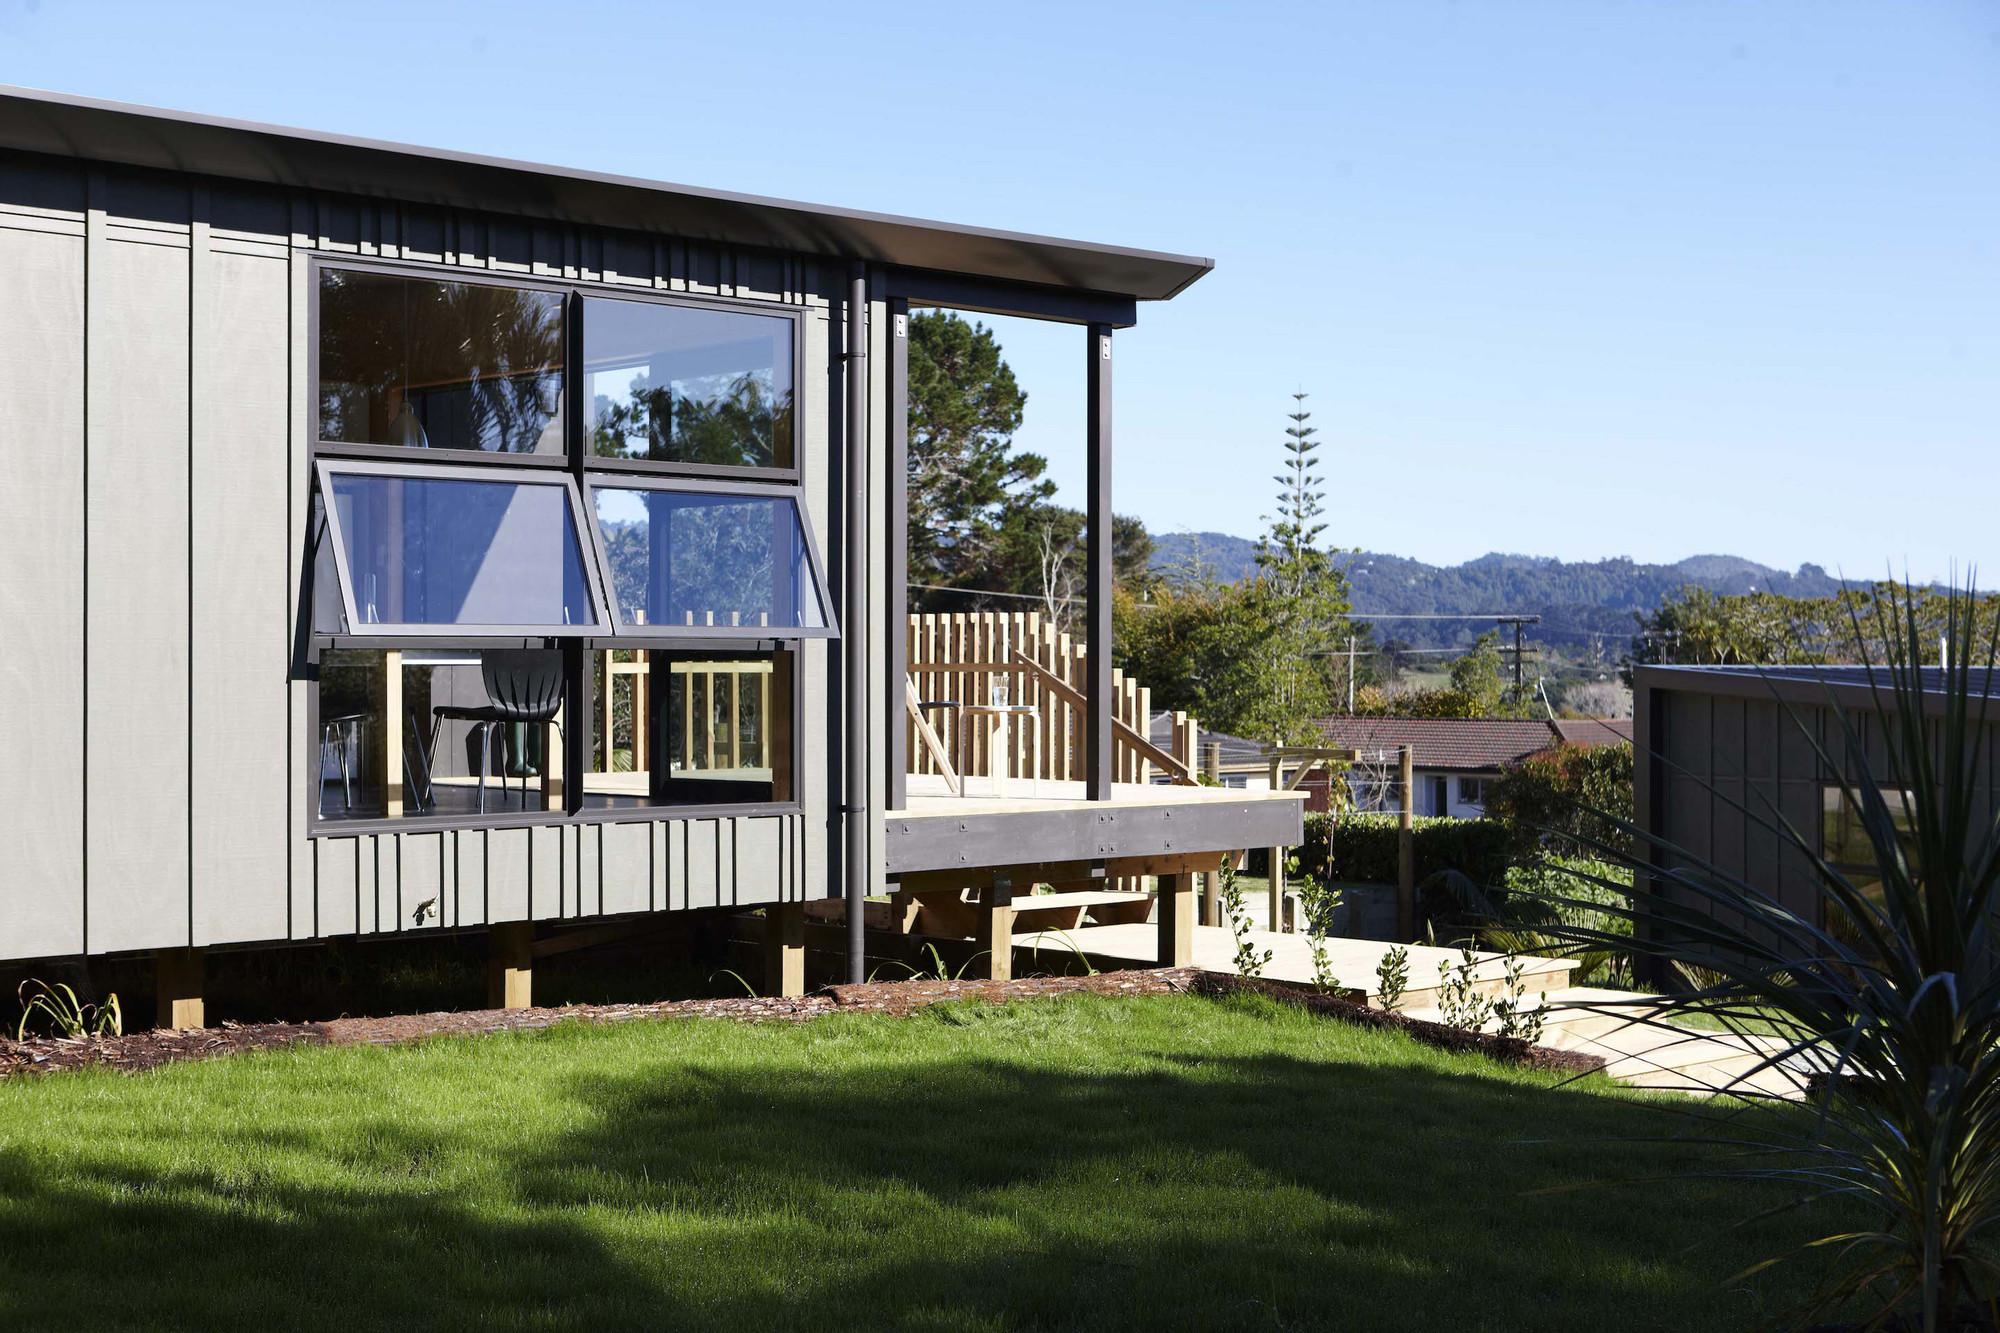 Studio 19 Community Housing